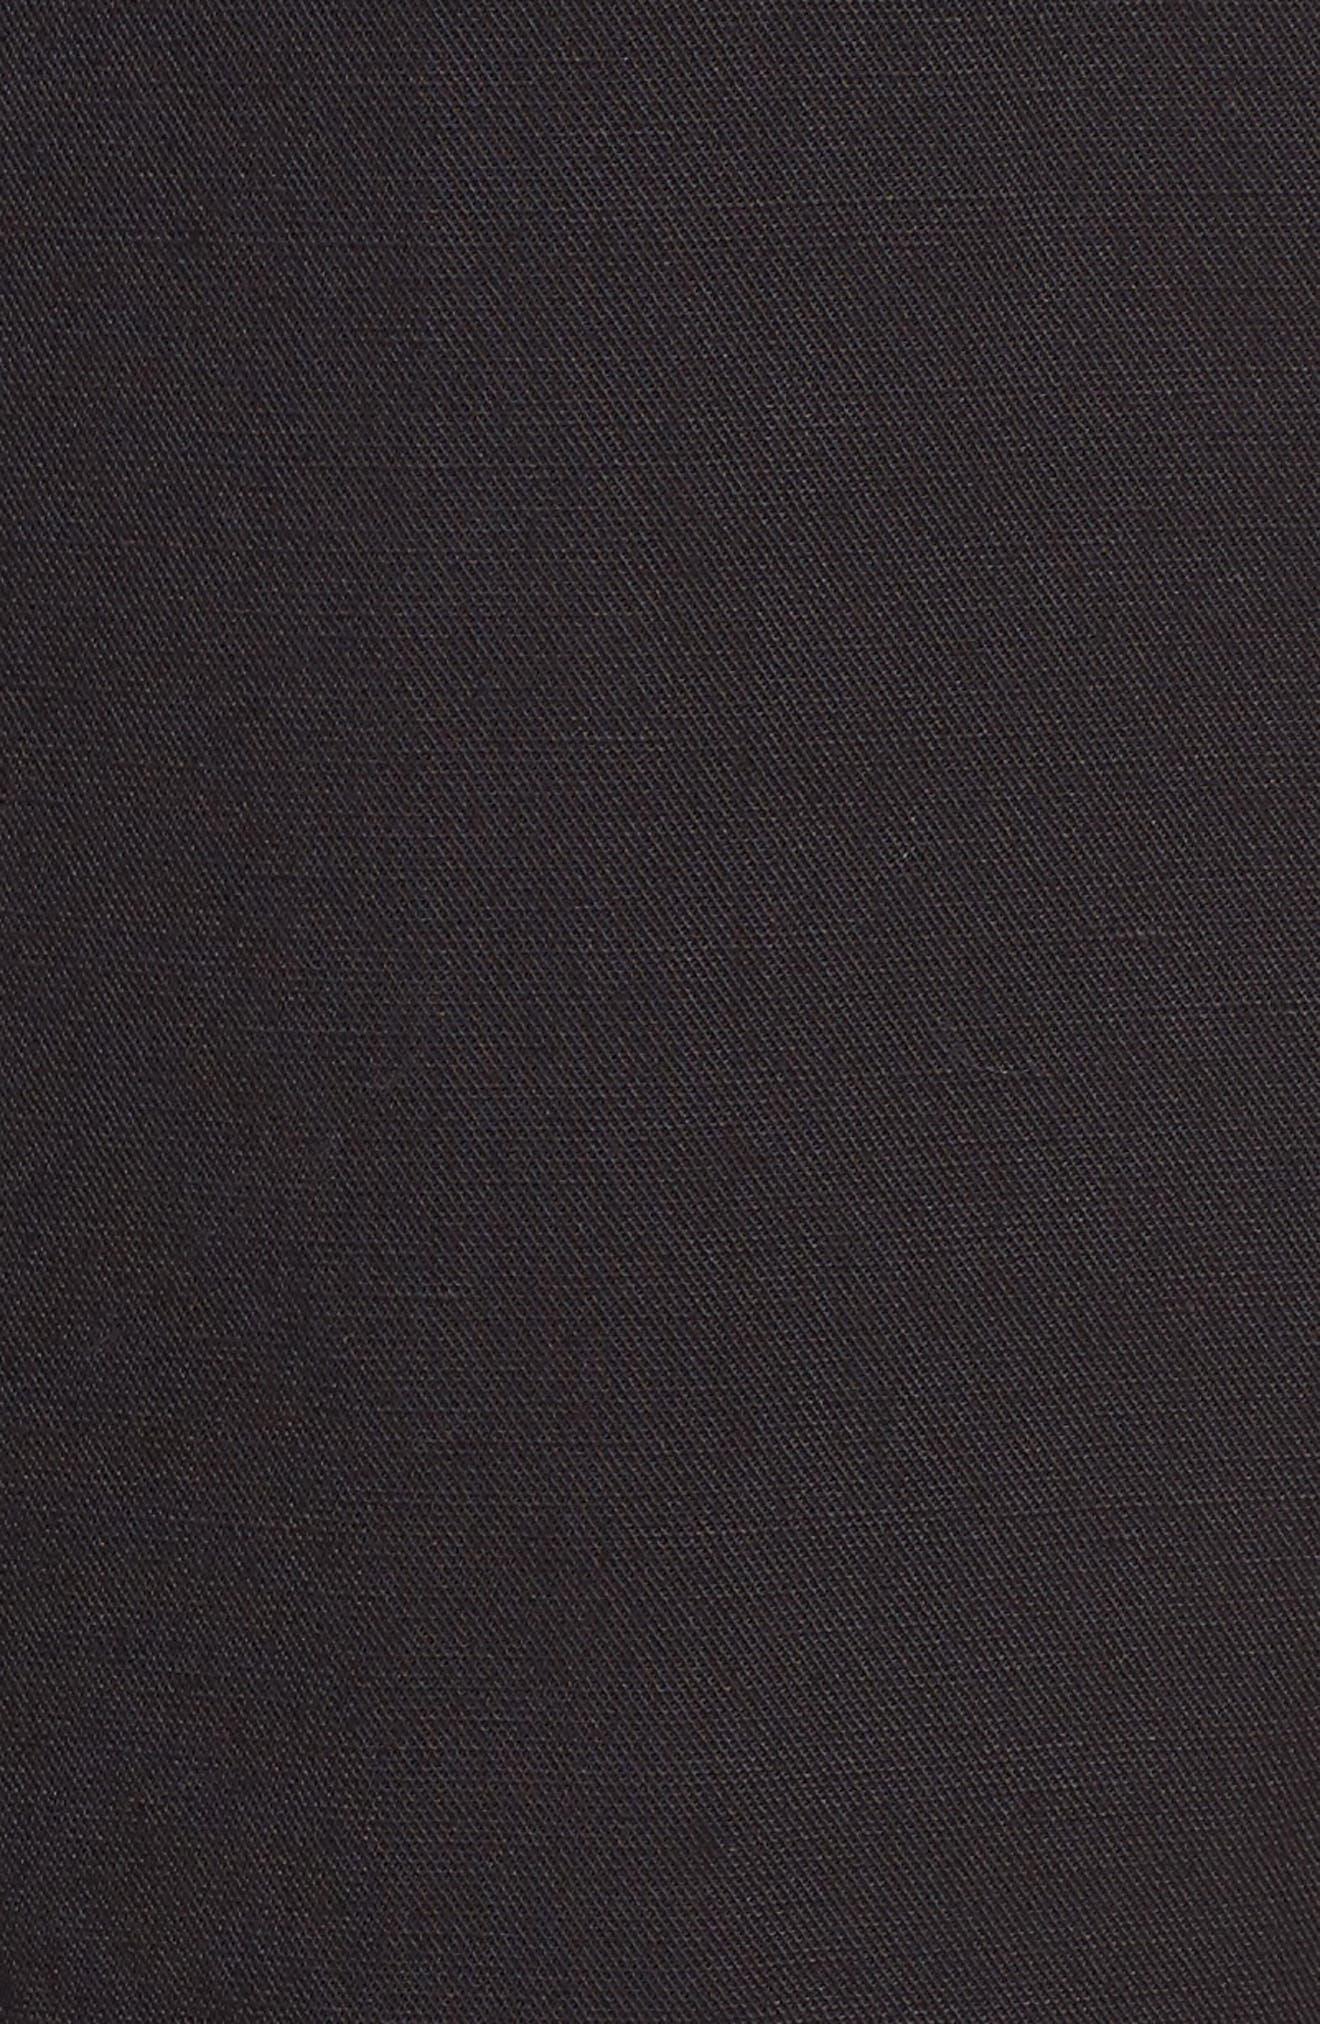 Tencel<sup>®</sup> Lyocell & Linen Walking Shorts,                             Alternate thumbnail 5, color,                             001